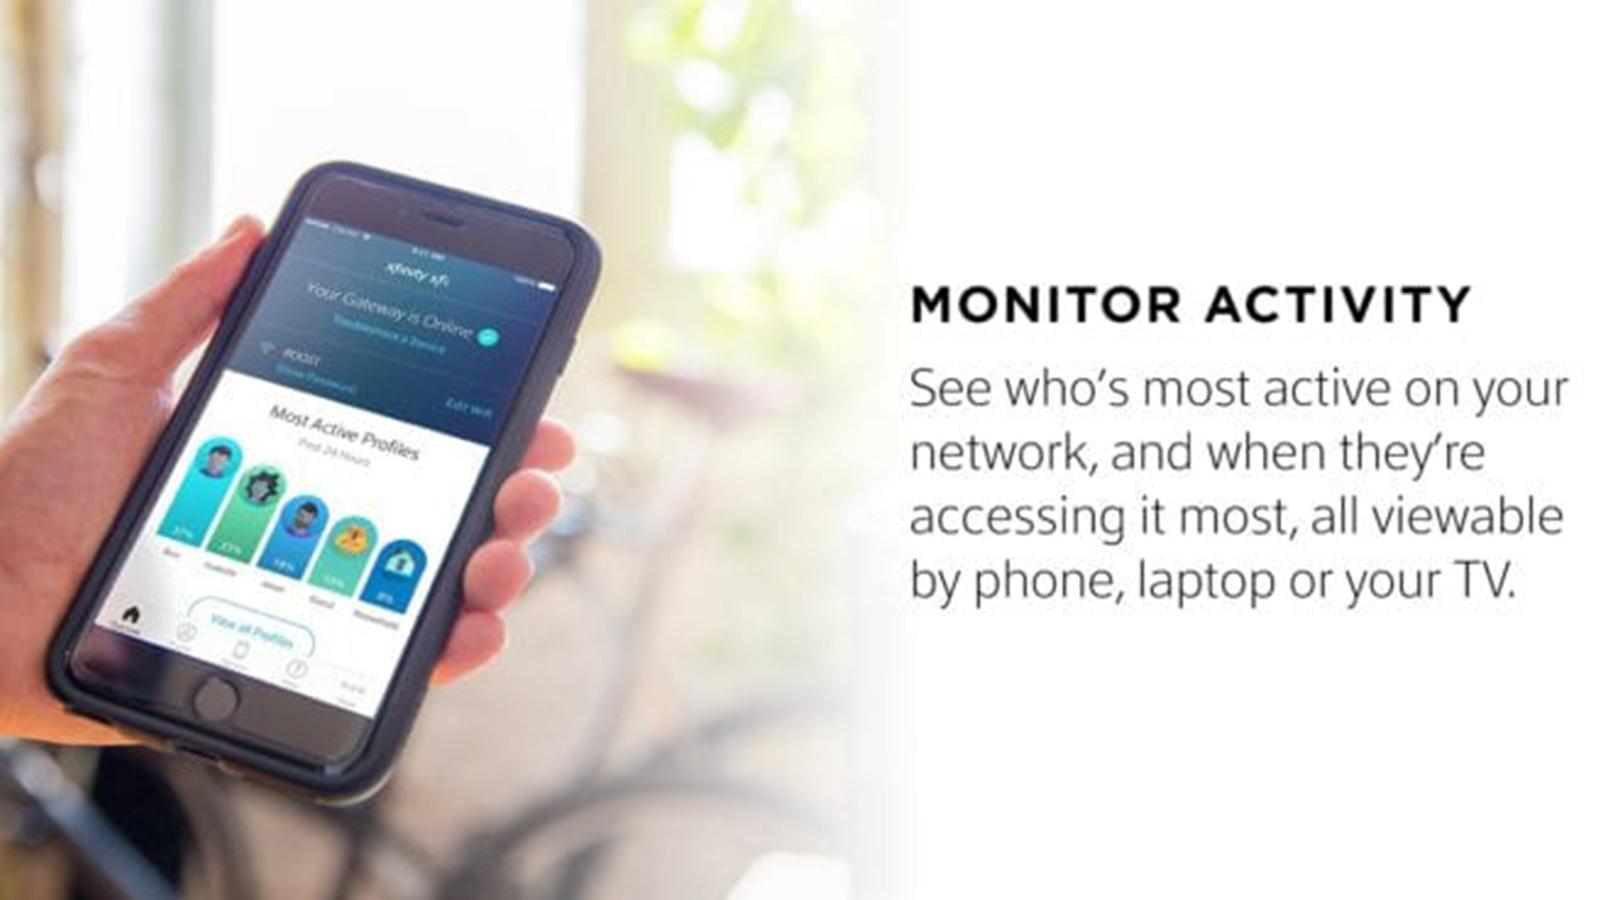 A smartphone displays the xfinity xFi app.